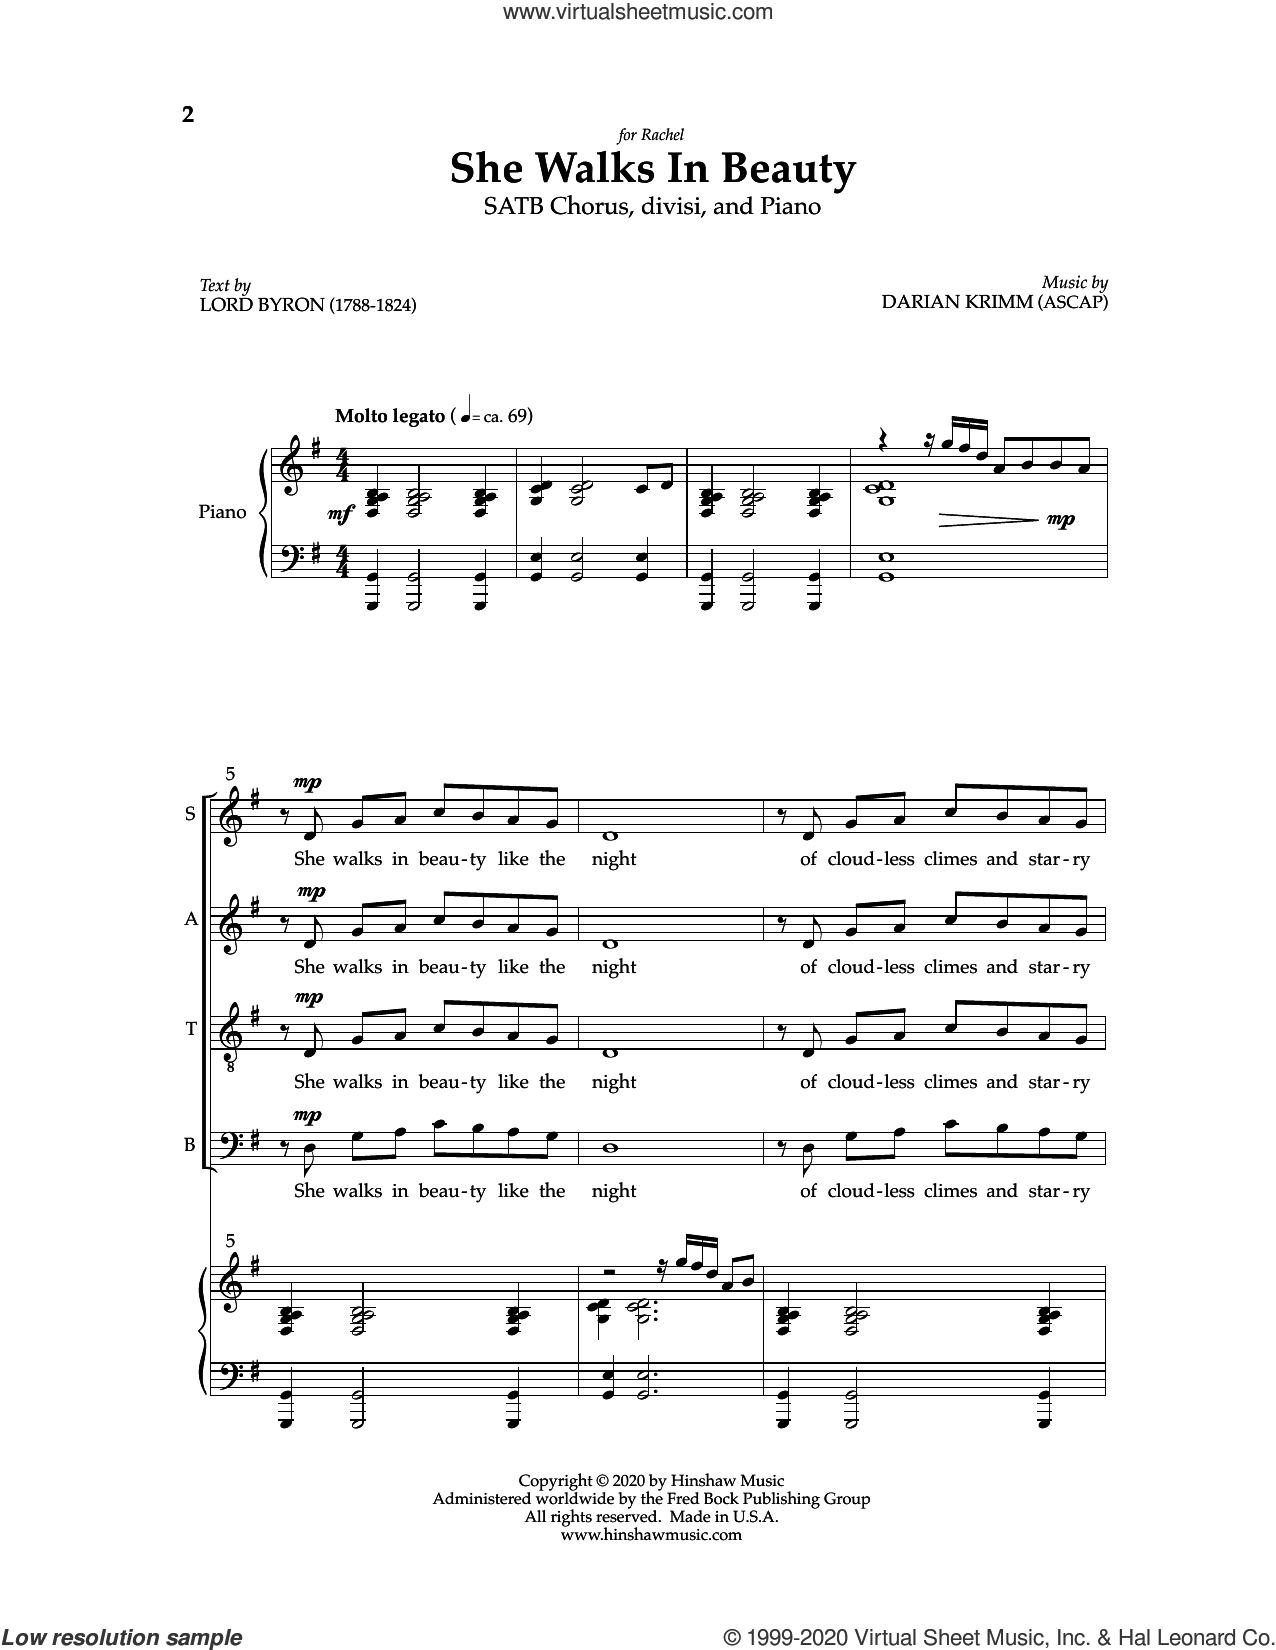 She Walks In Beauty sheet music for choir (SATB: soprano, alto, tenor, bass) by Darian Krimm and Lord Byron, intermediate skill level